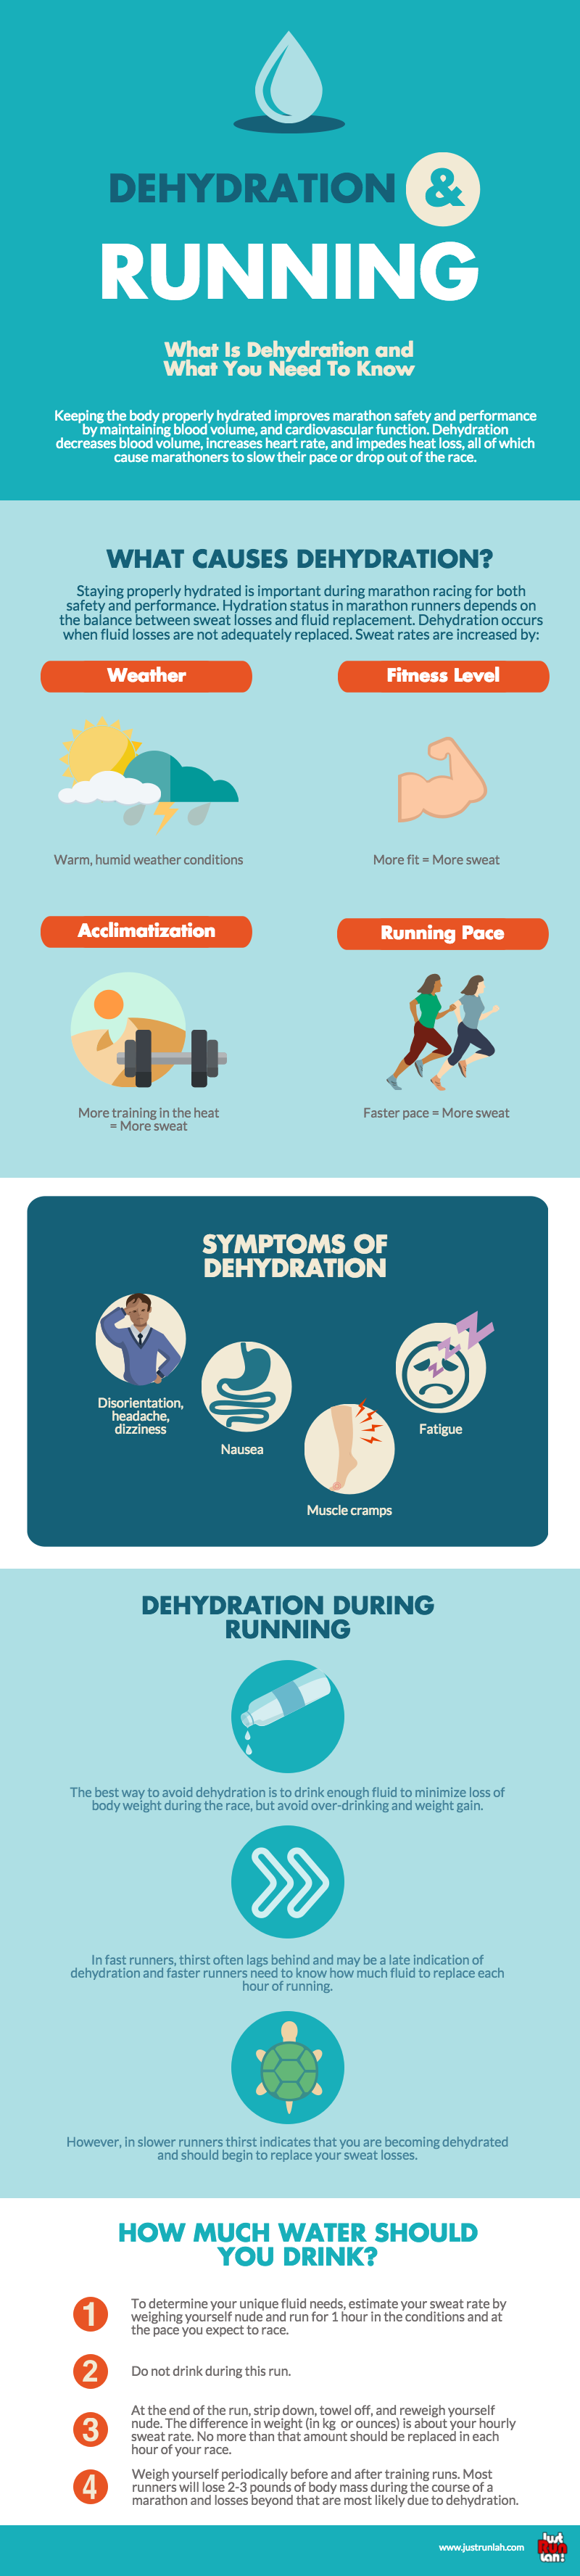 dehydration & running-1